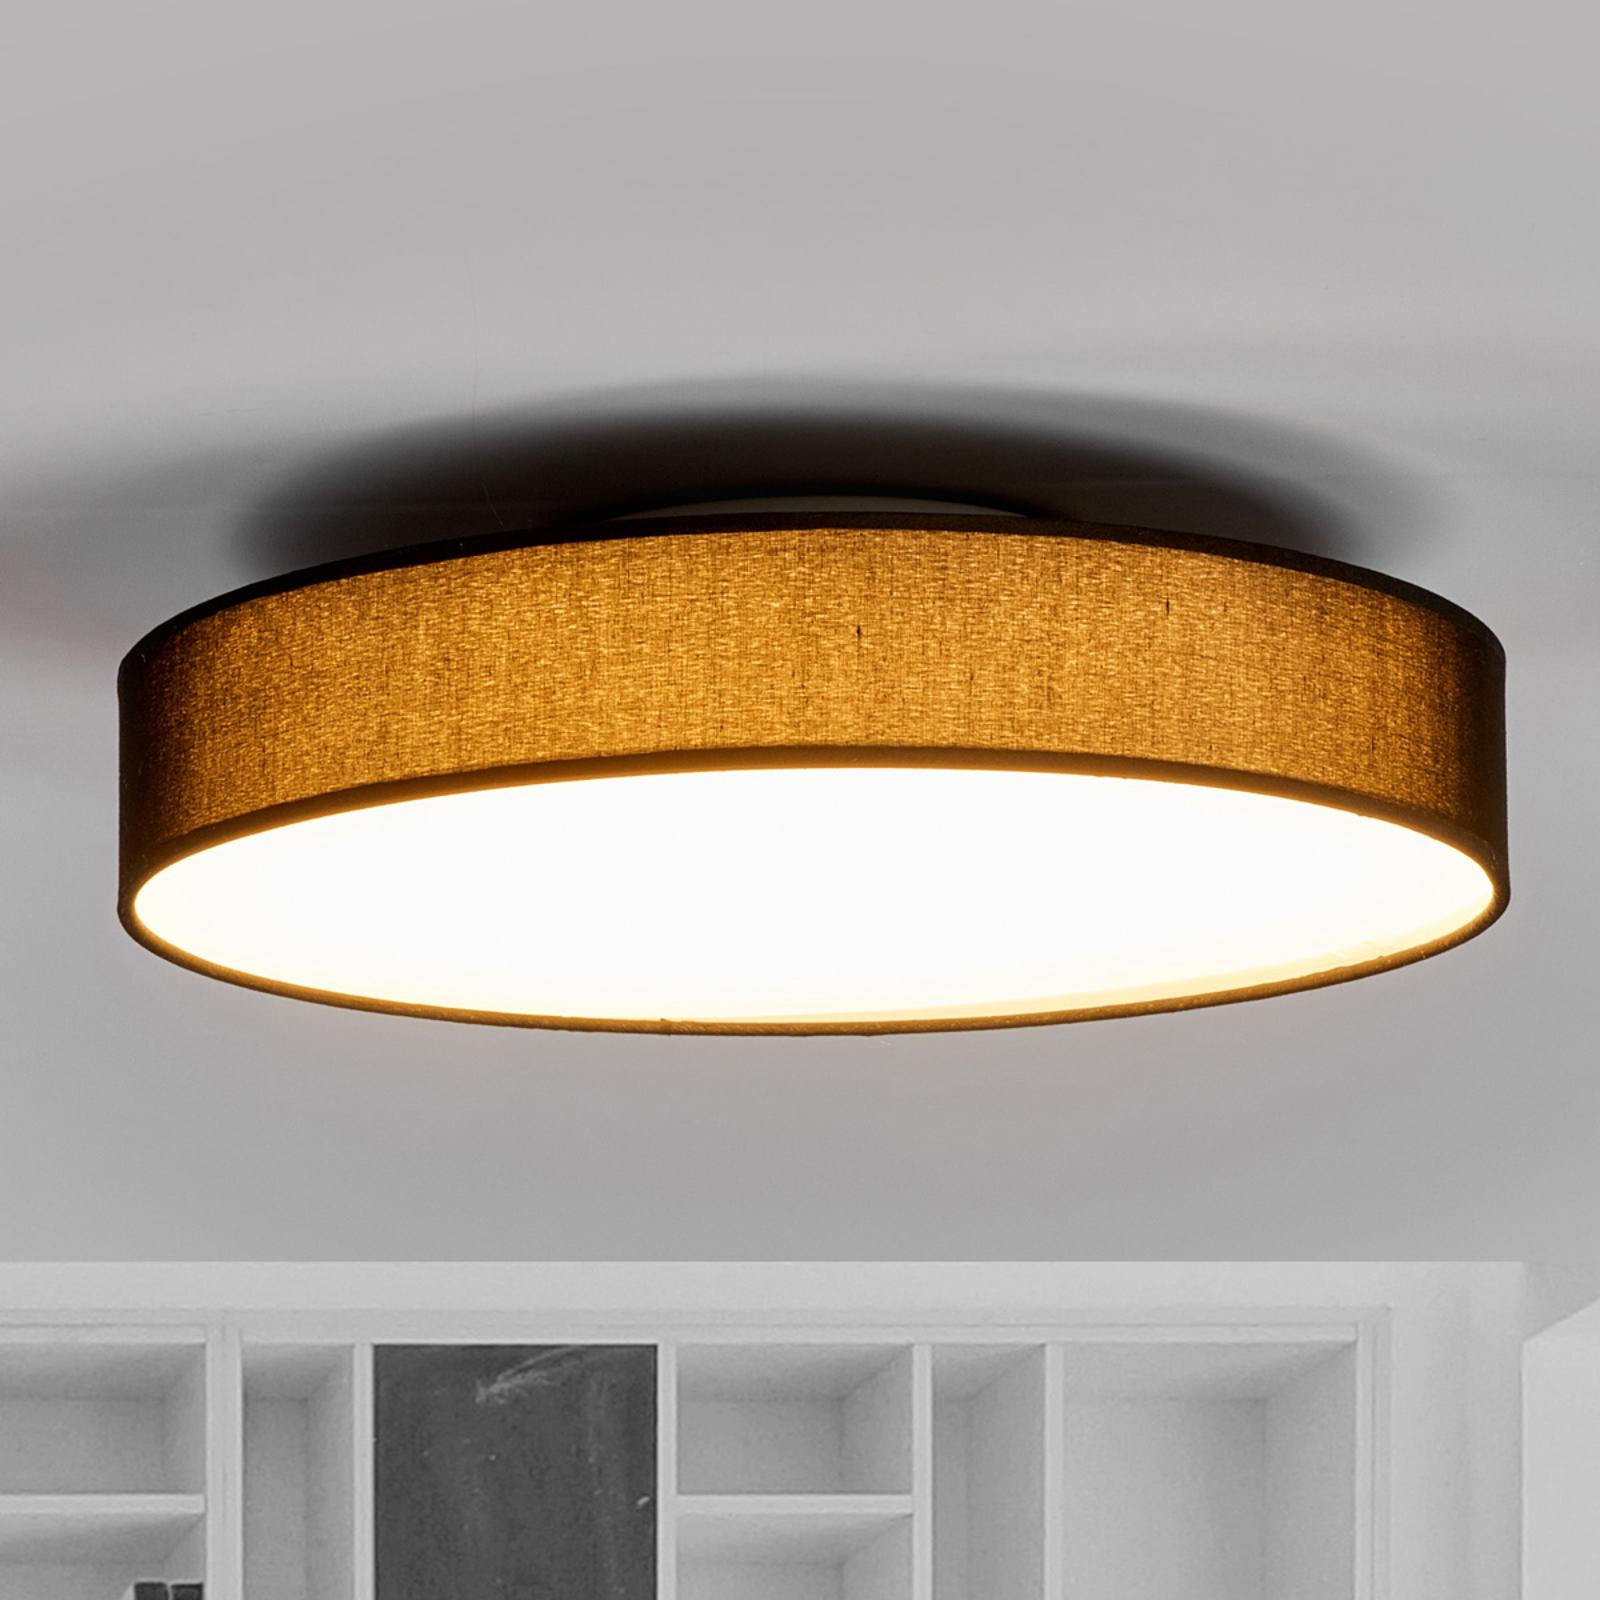 LED-taklampa Saira textil, 40 cm, svart